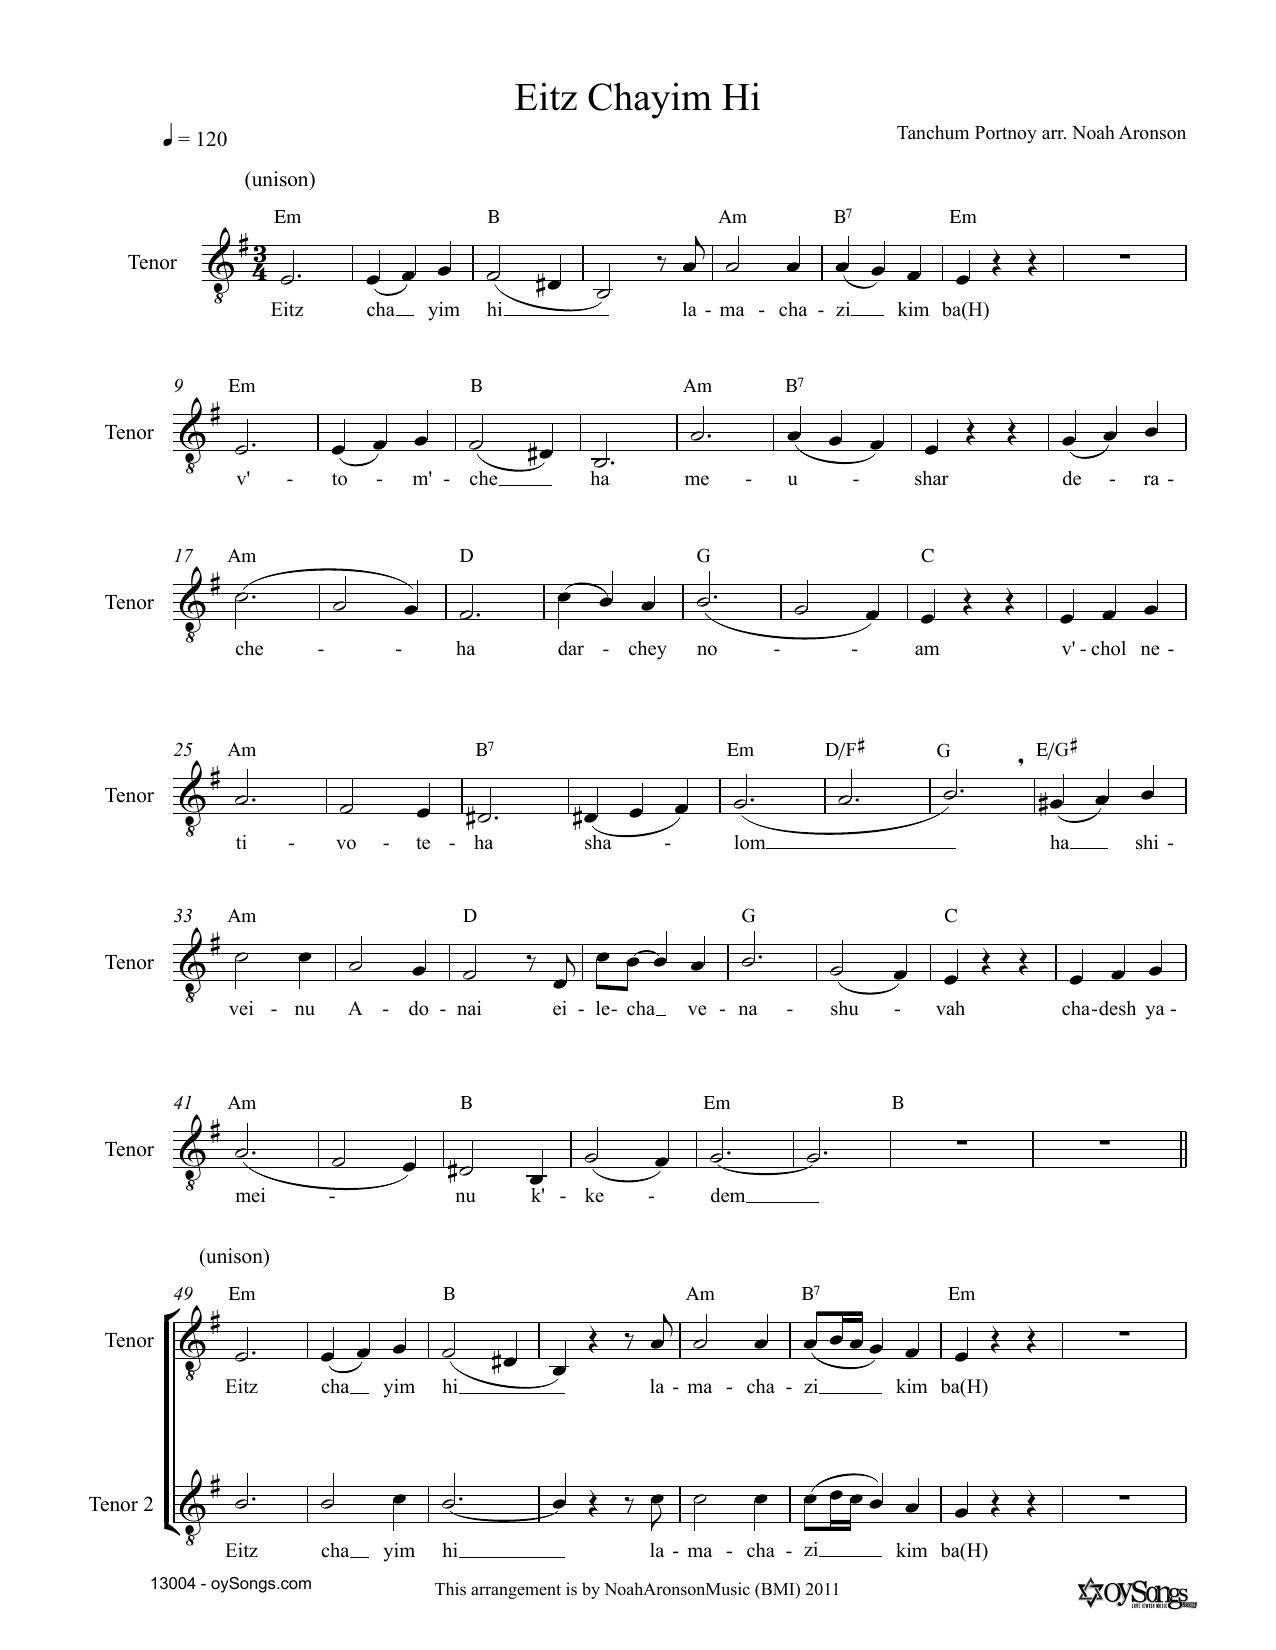 Noah Aronson Eitz Chayim Hi sheet music notes and chords. Download Printable PDF.